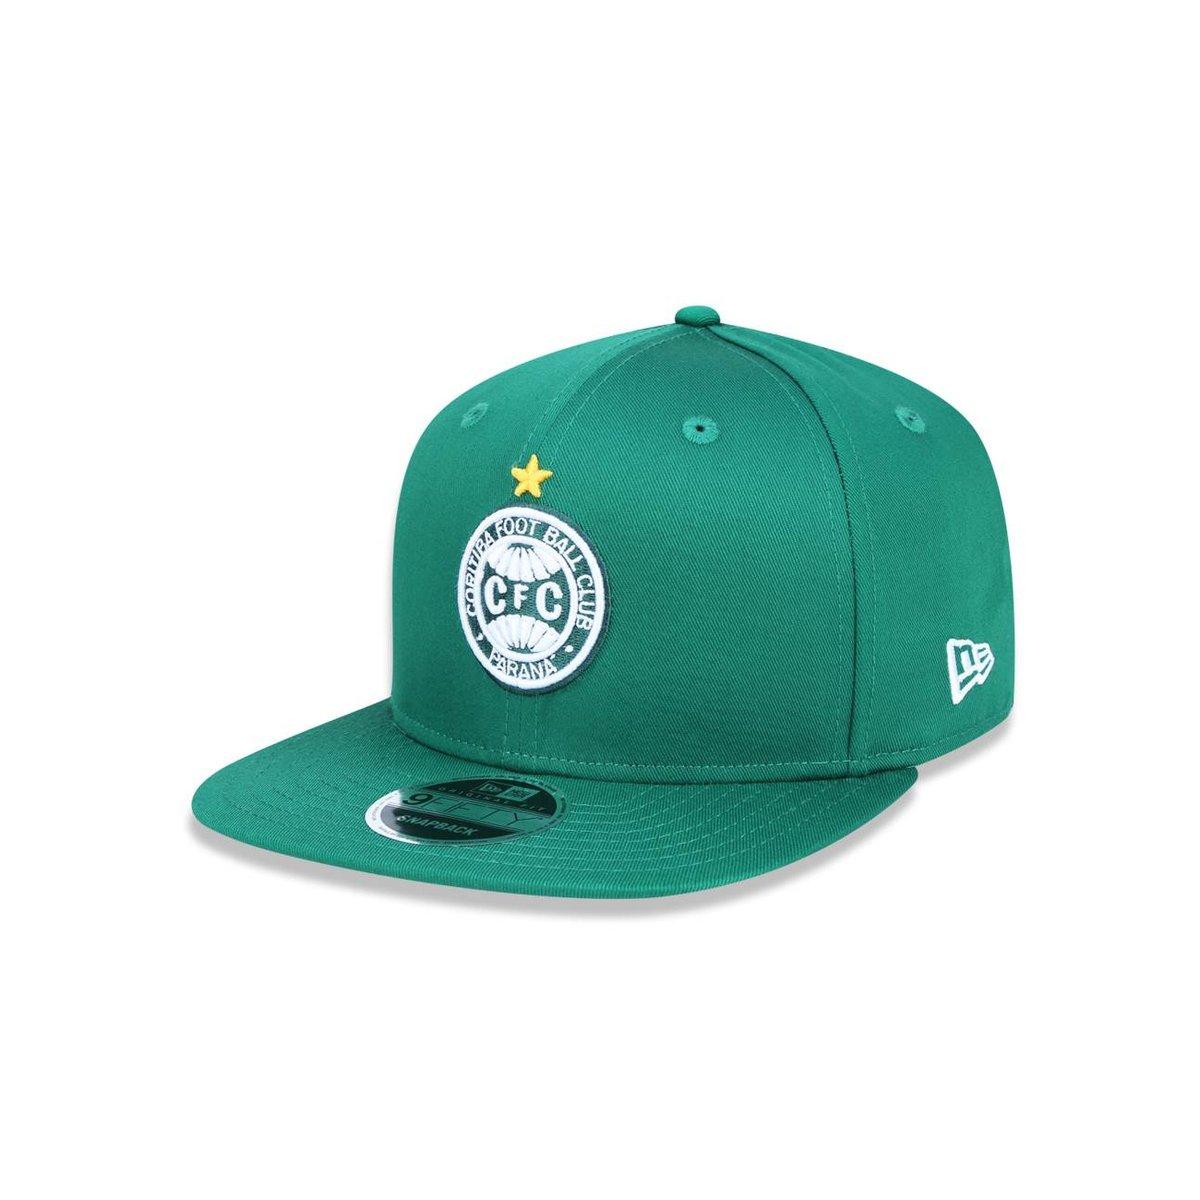 4caa6cff0 Boné 950 Original Fit Coritiba Futebol Aba Reta Snapback New Era - Verde -  Compre Agora